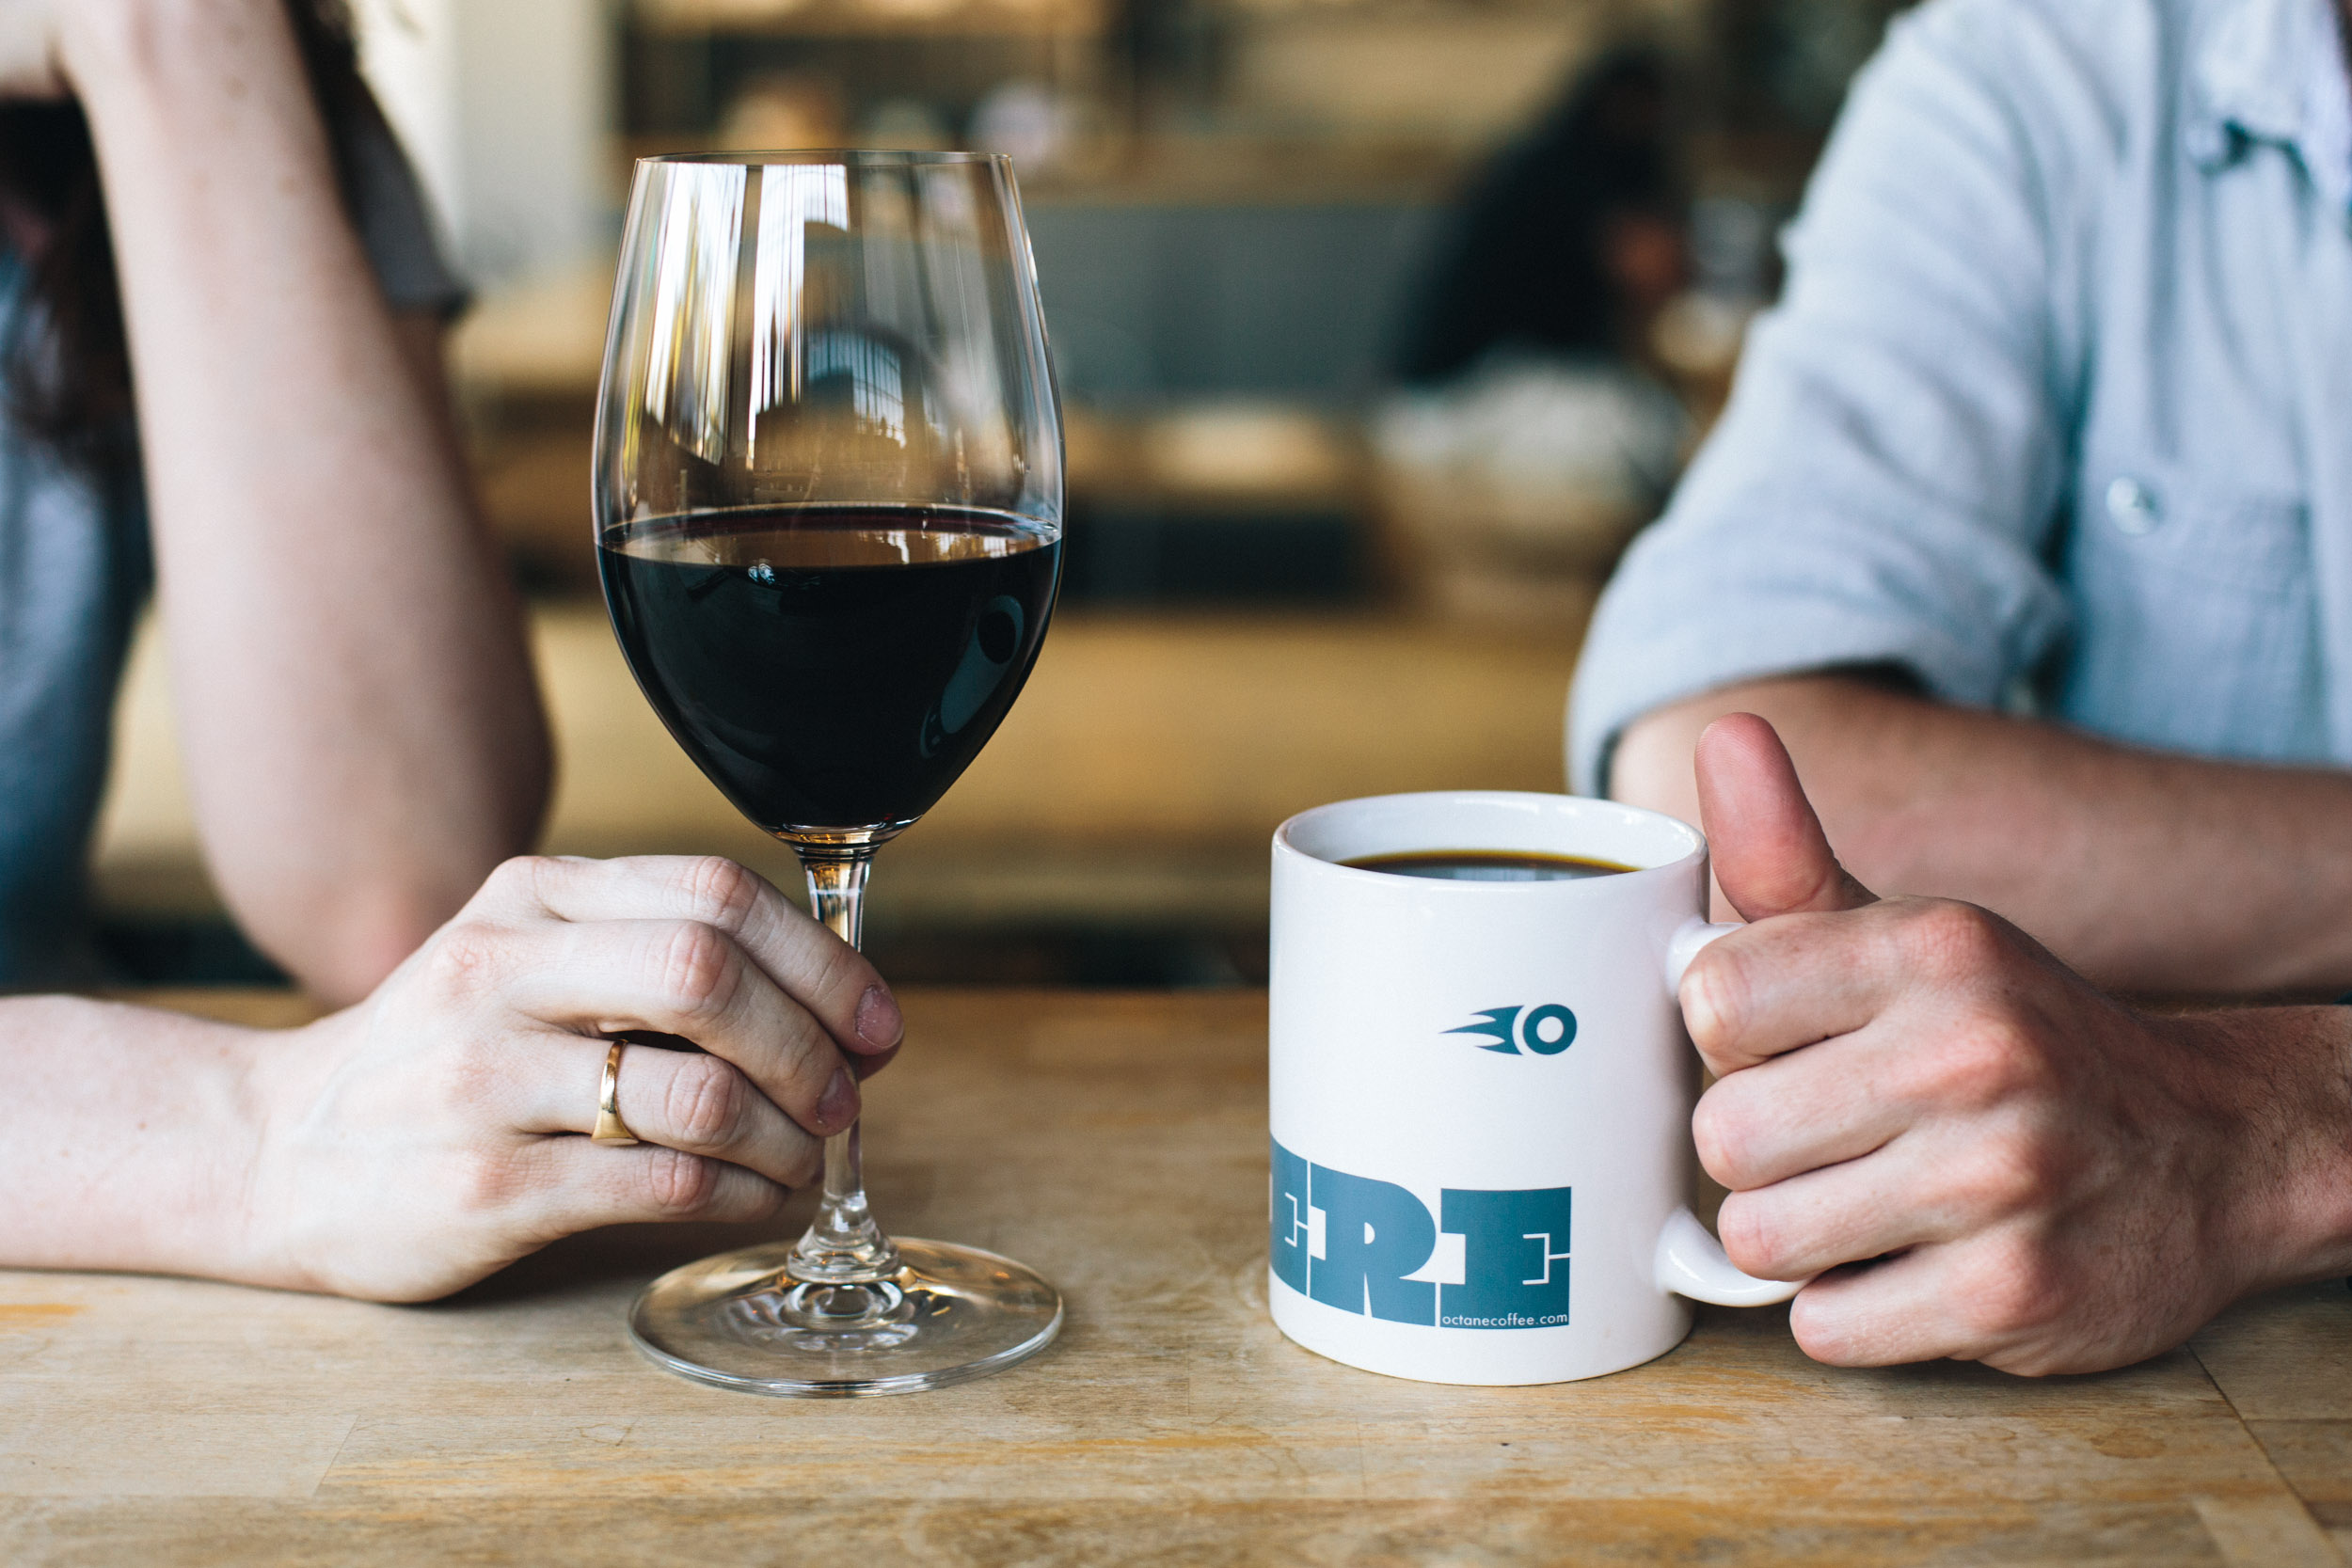 jimmy-rowalt-atlanta-coffee-food-drink-photography-020.jpg